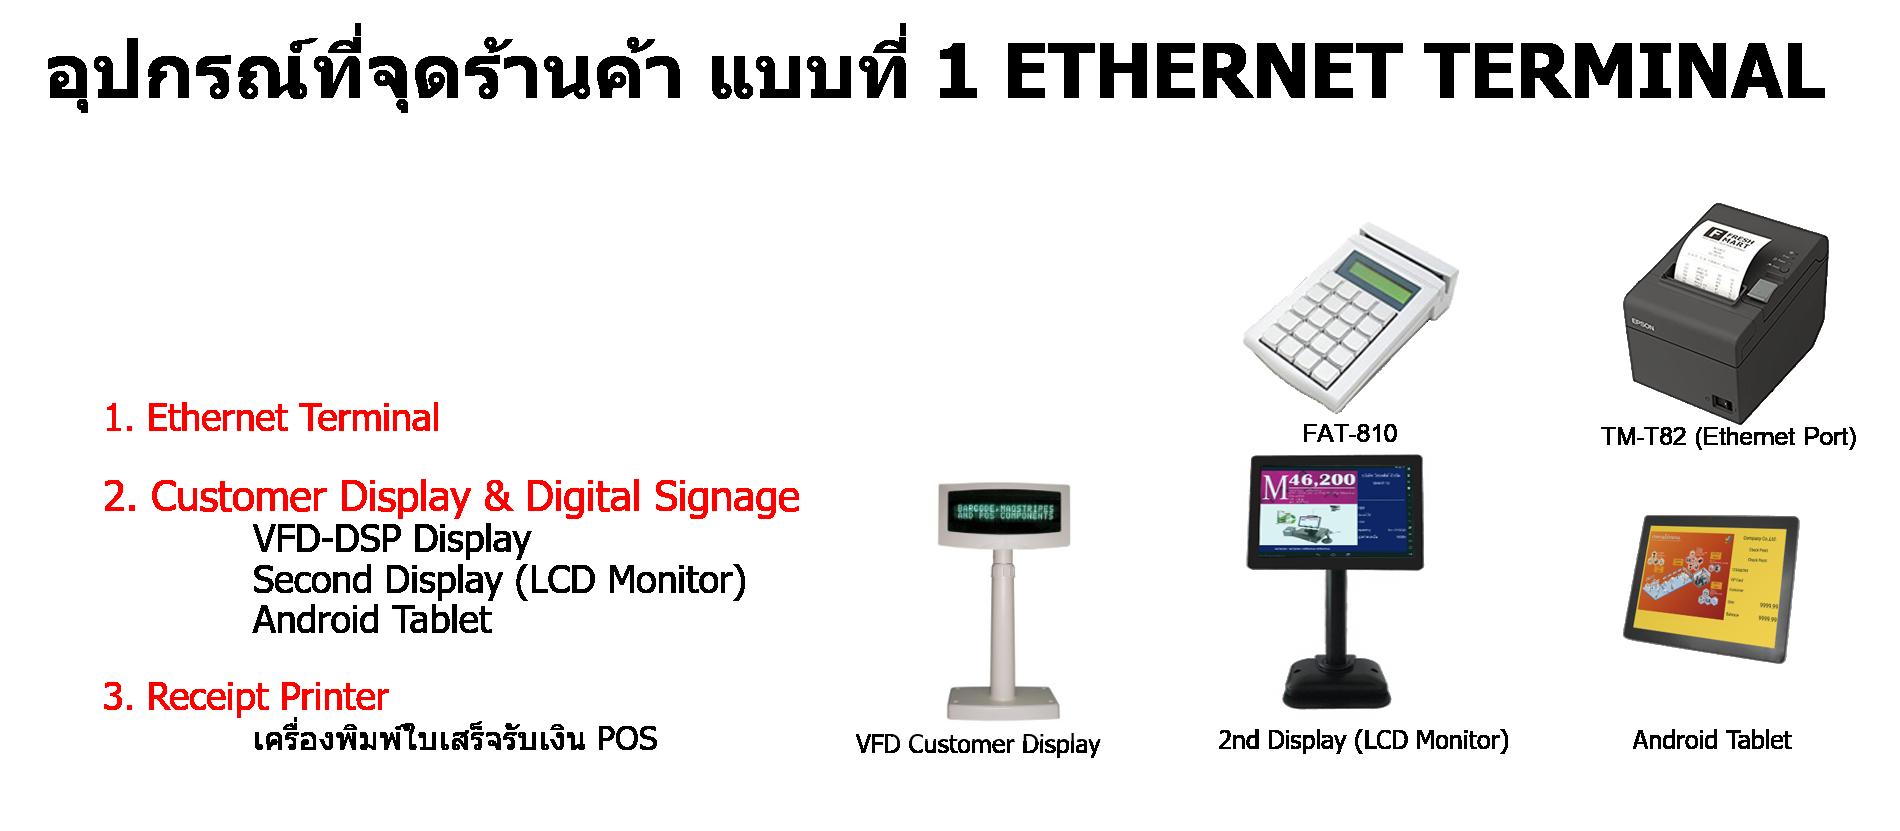 ethernet terminal